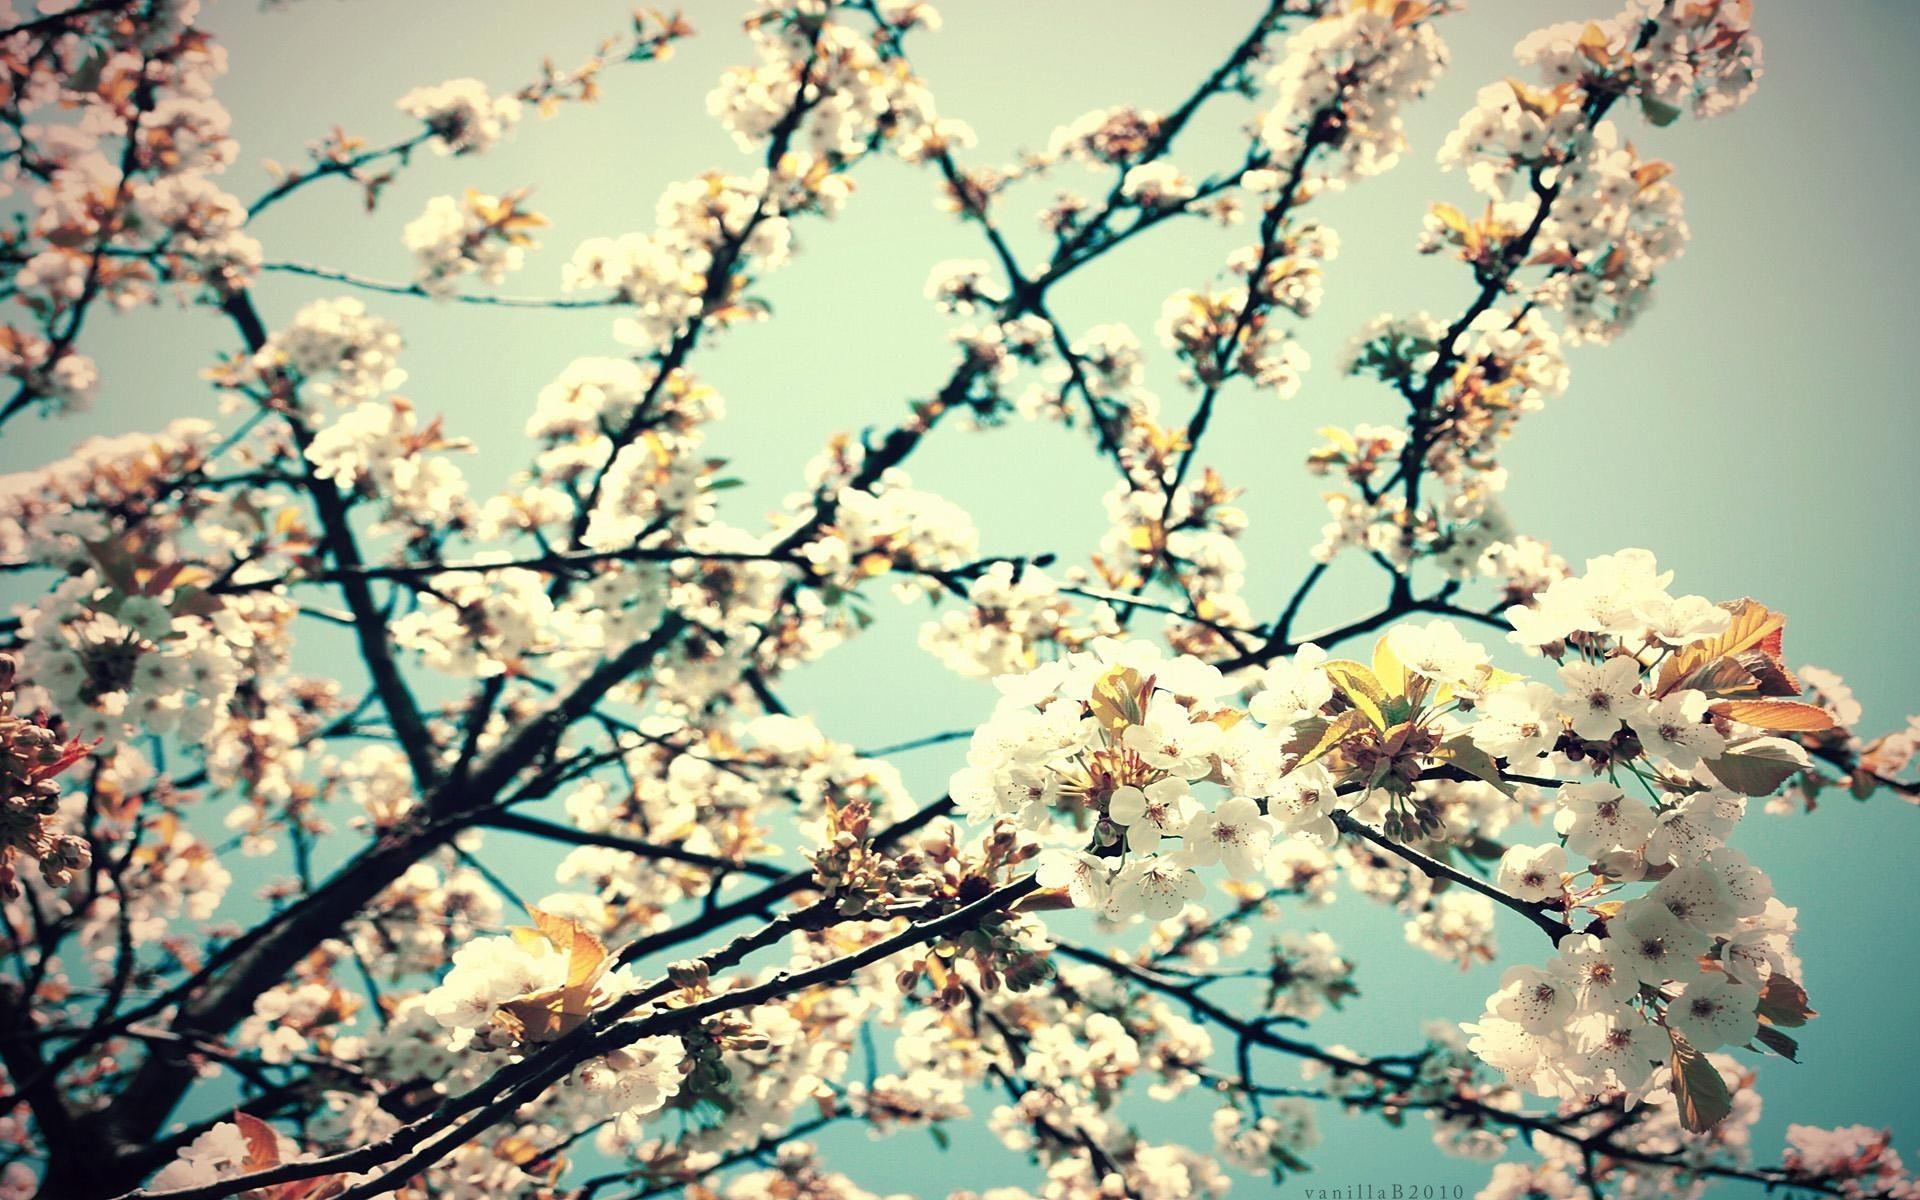 Hipster Flower Backgrounds (51+ images)